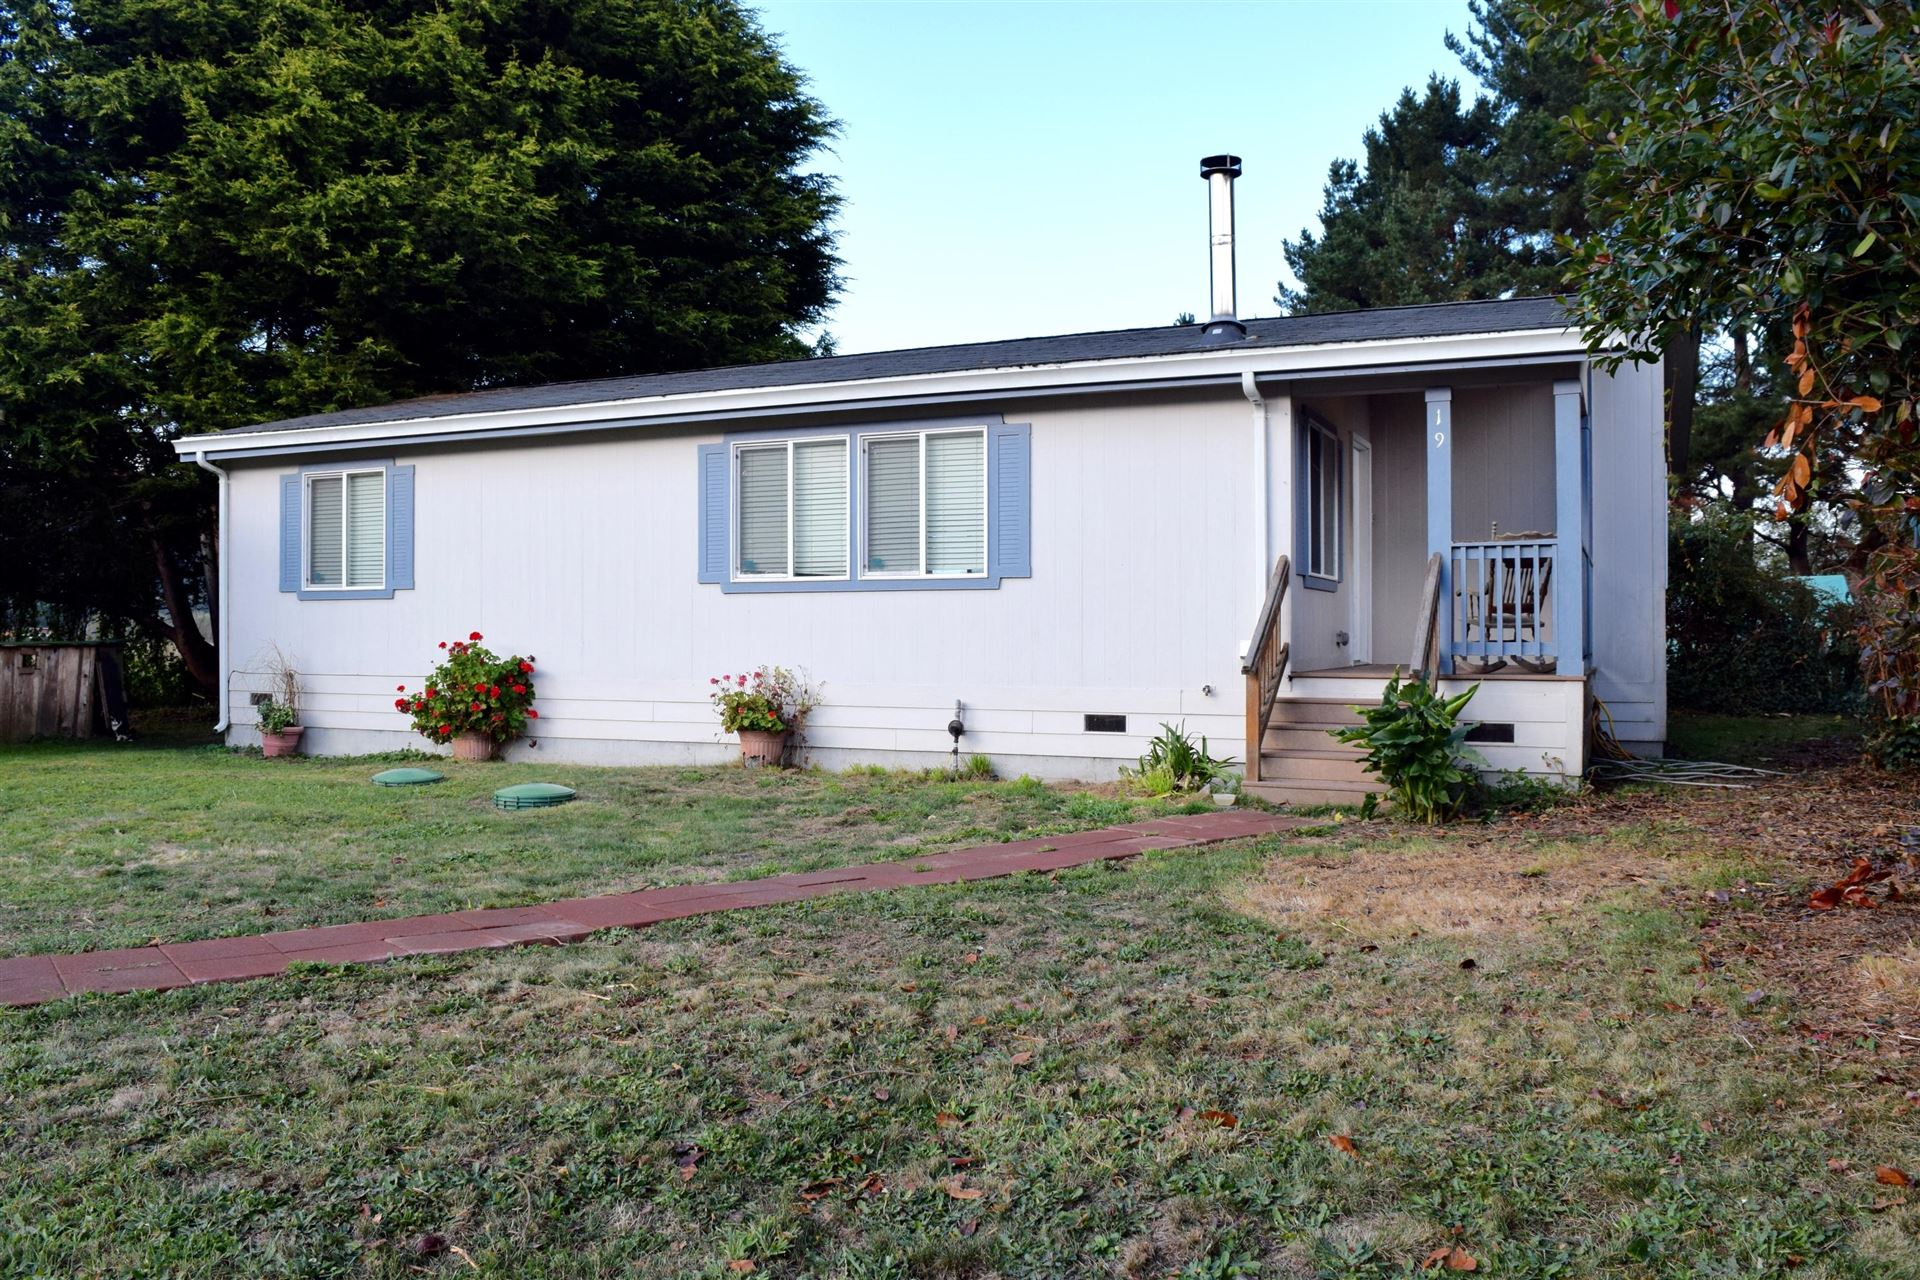 19 Redwood Street, Orick, CA 95555 - MLS#: 257783